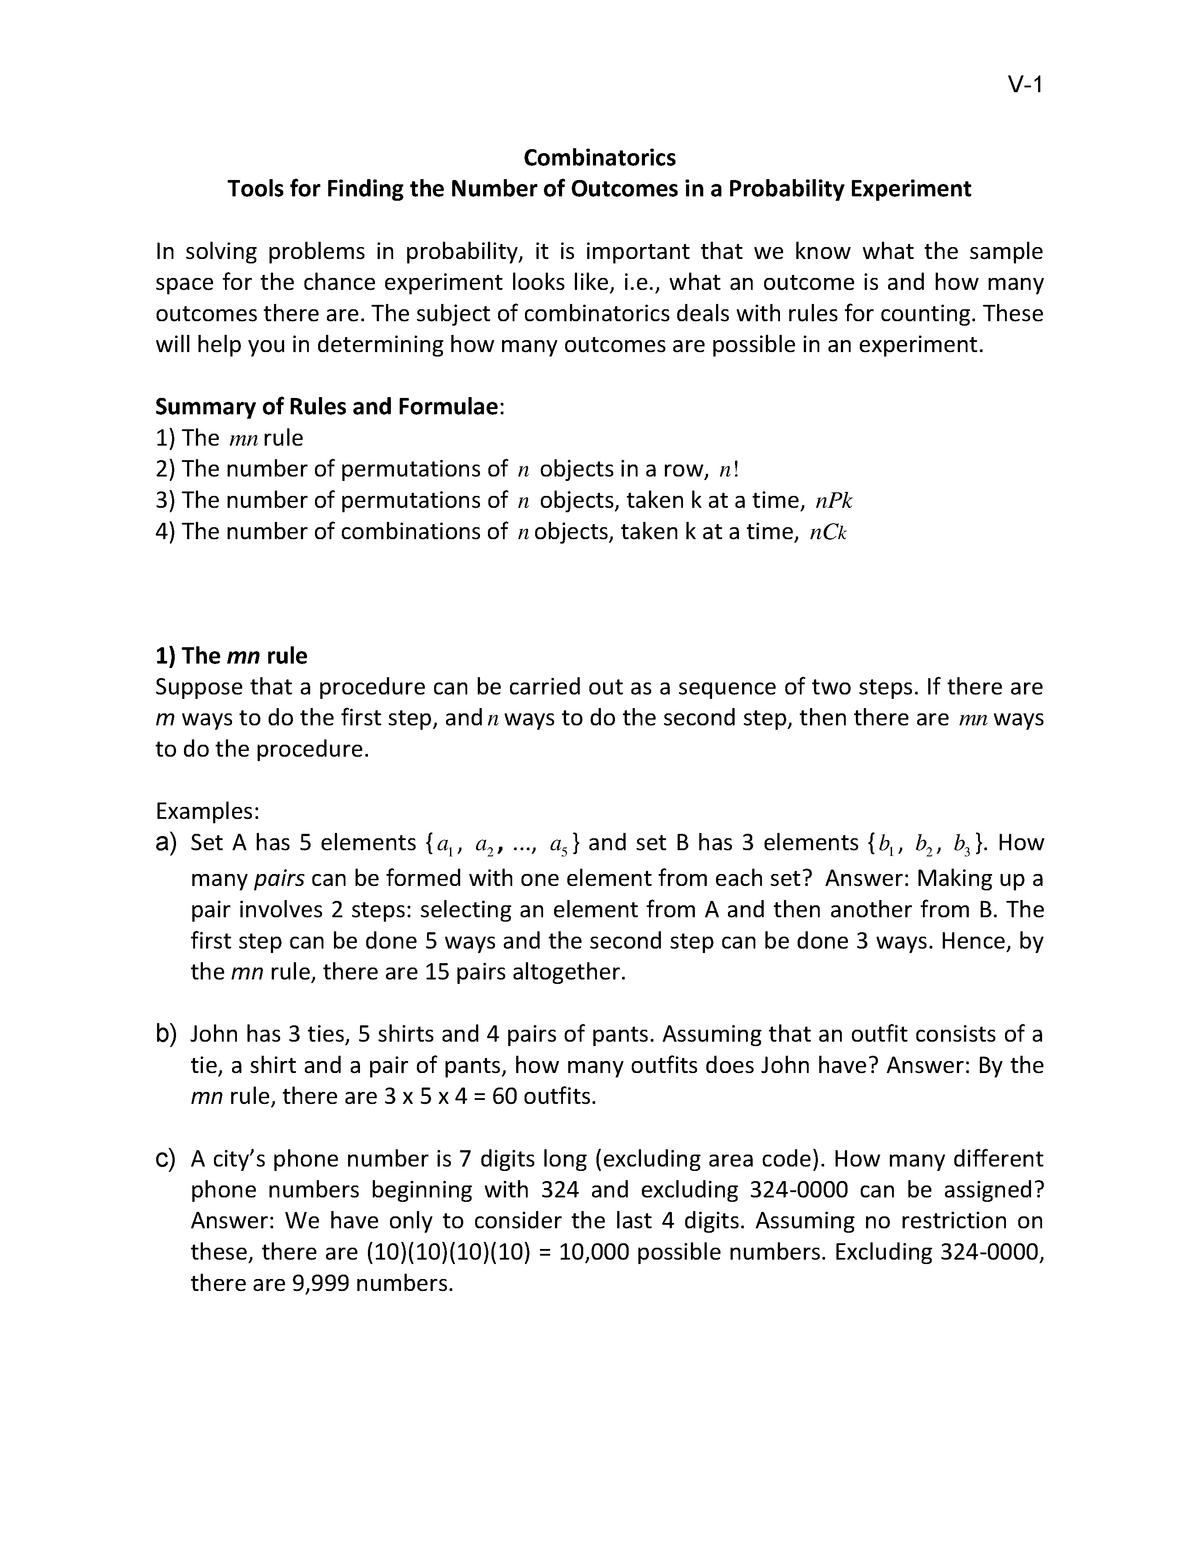 Chapter 5 - Combinatorics - STAT 1181: Descriptive and Elementary